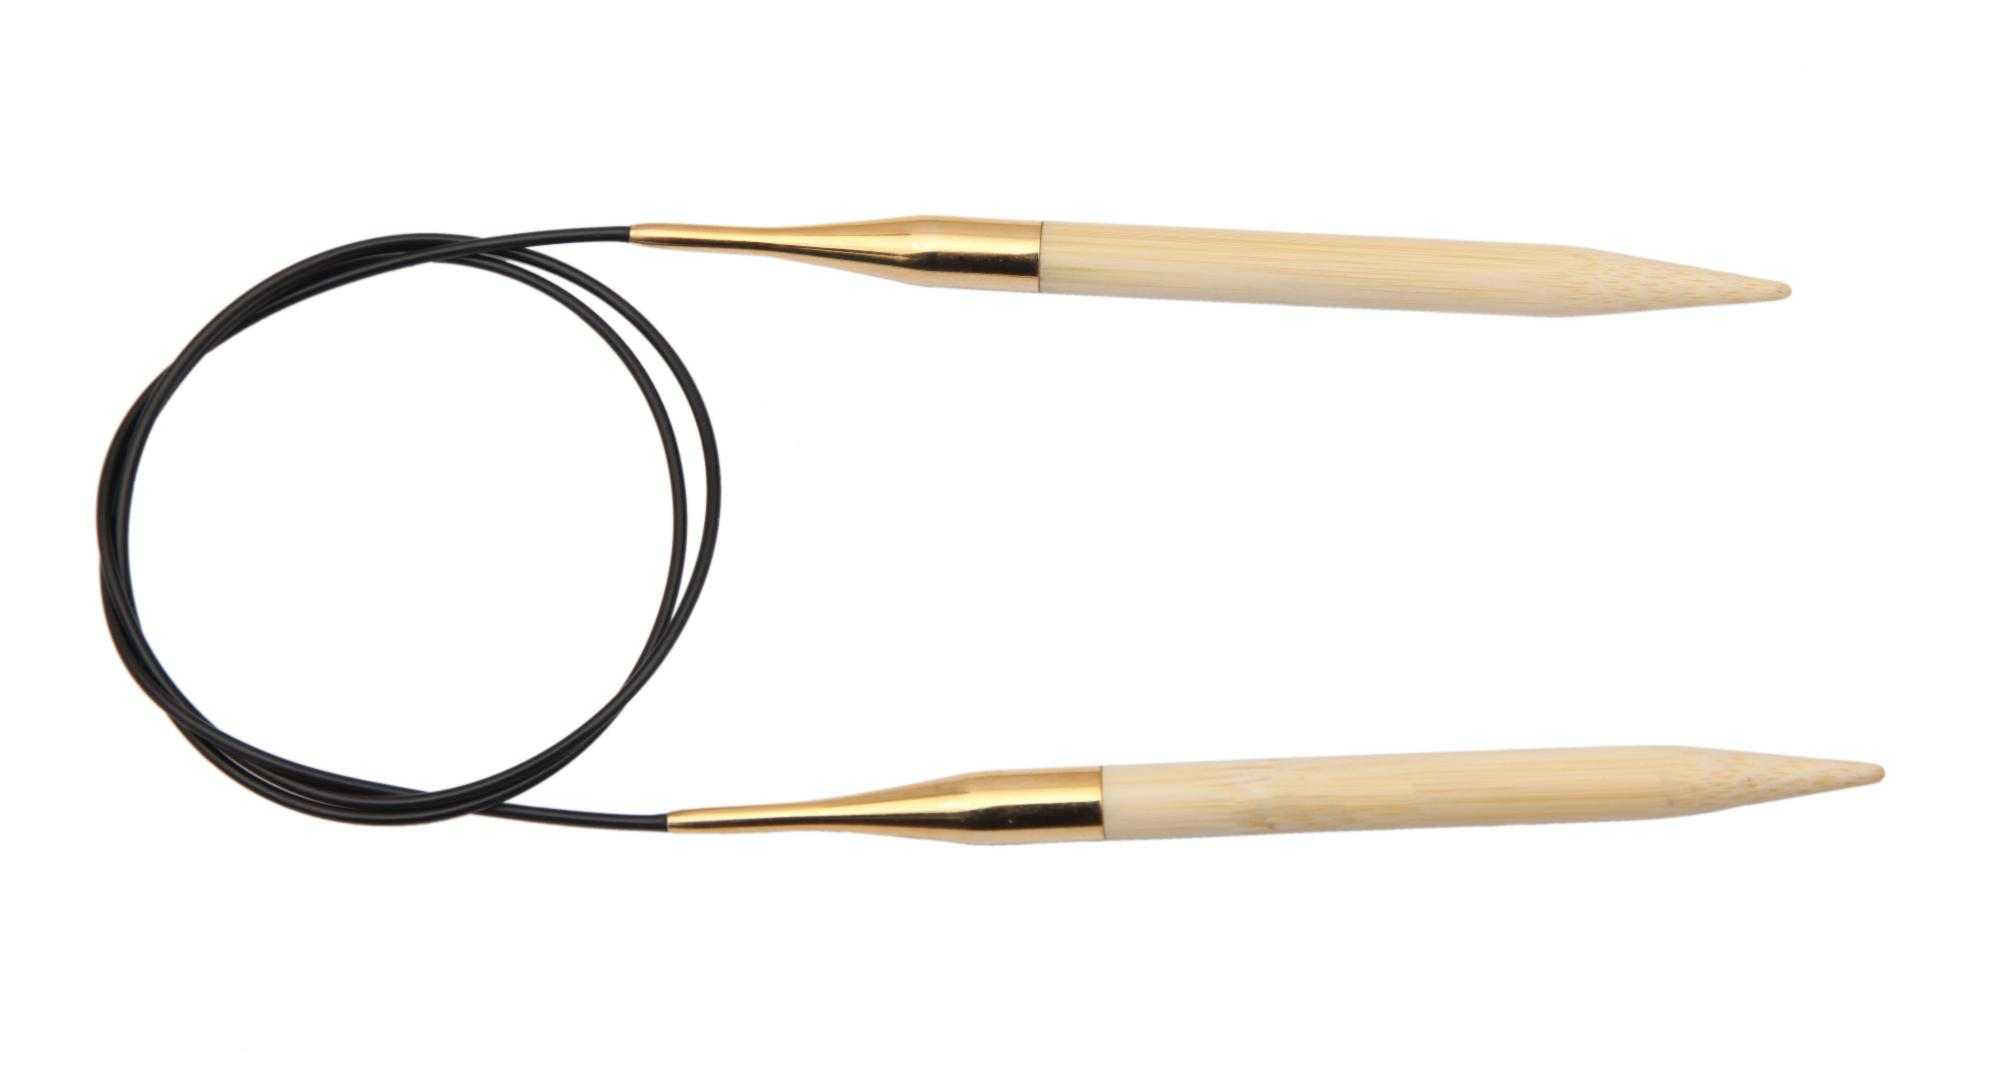 Спицы круговые 80 см Bamboo KnitPro, 22252, 6.50 мм